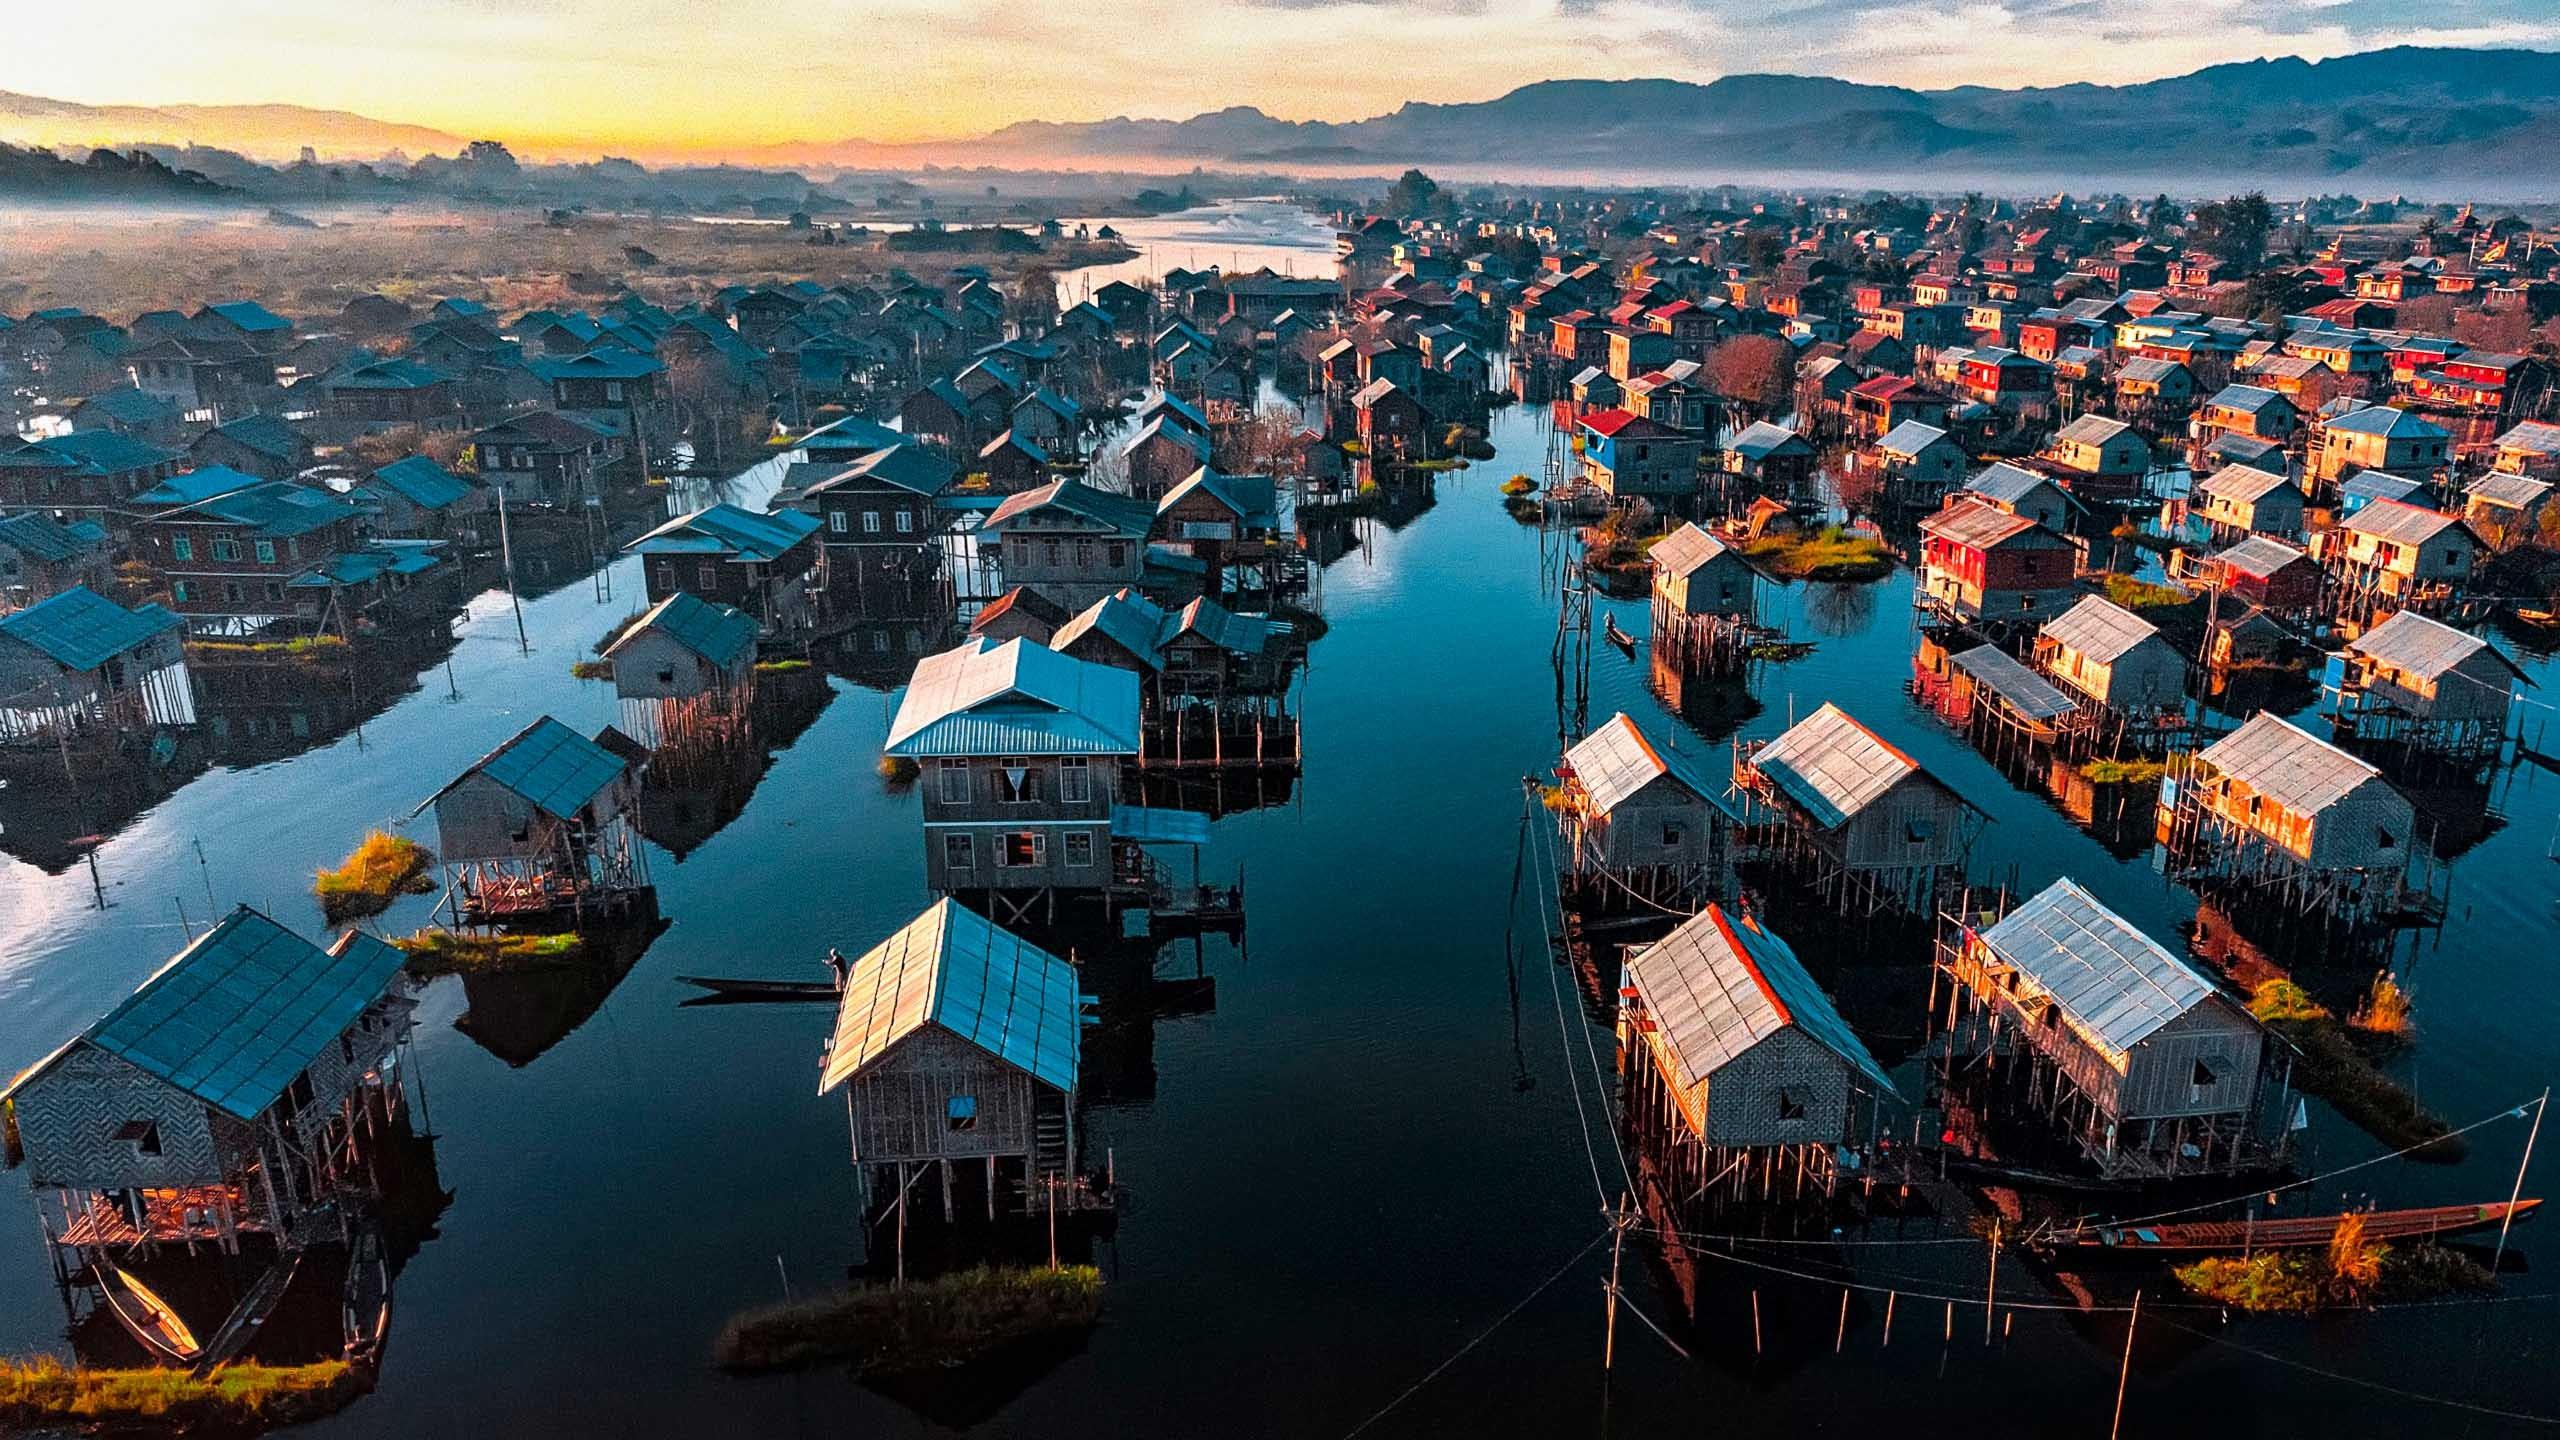 Häuser auf Inle-See in Myanmar